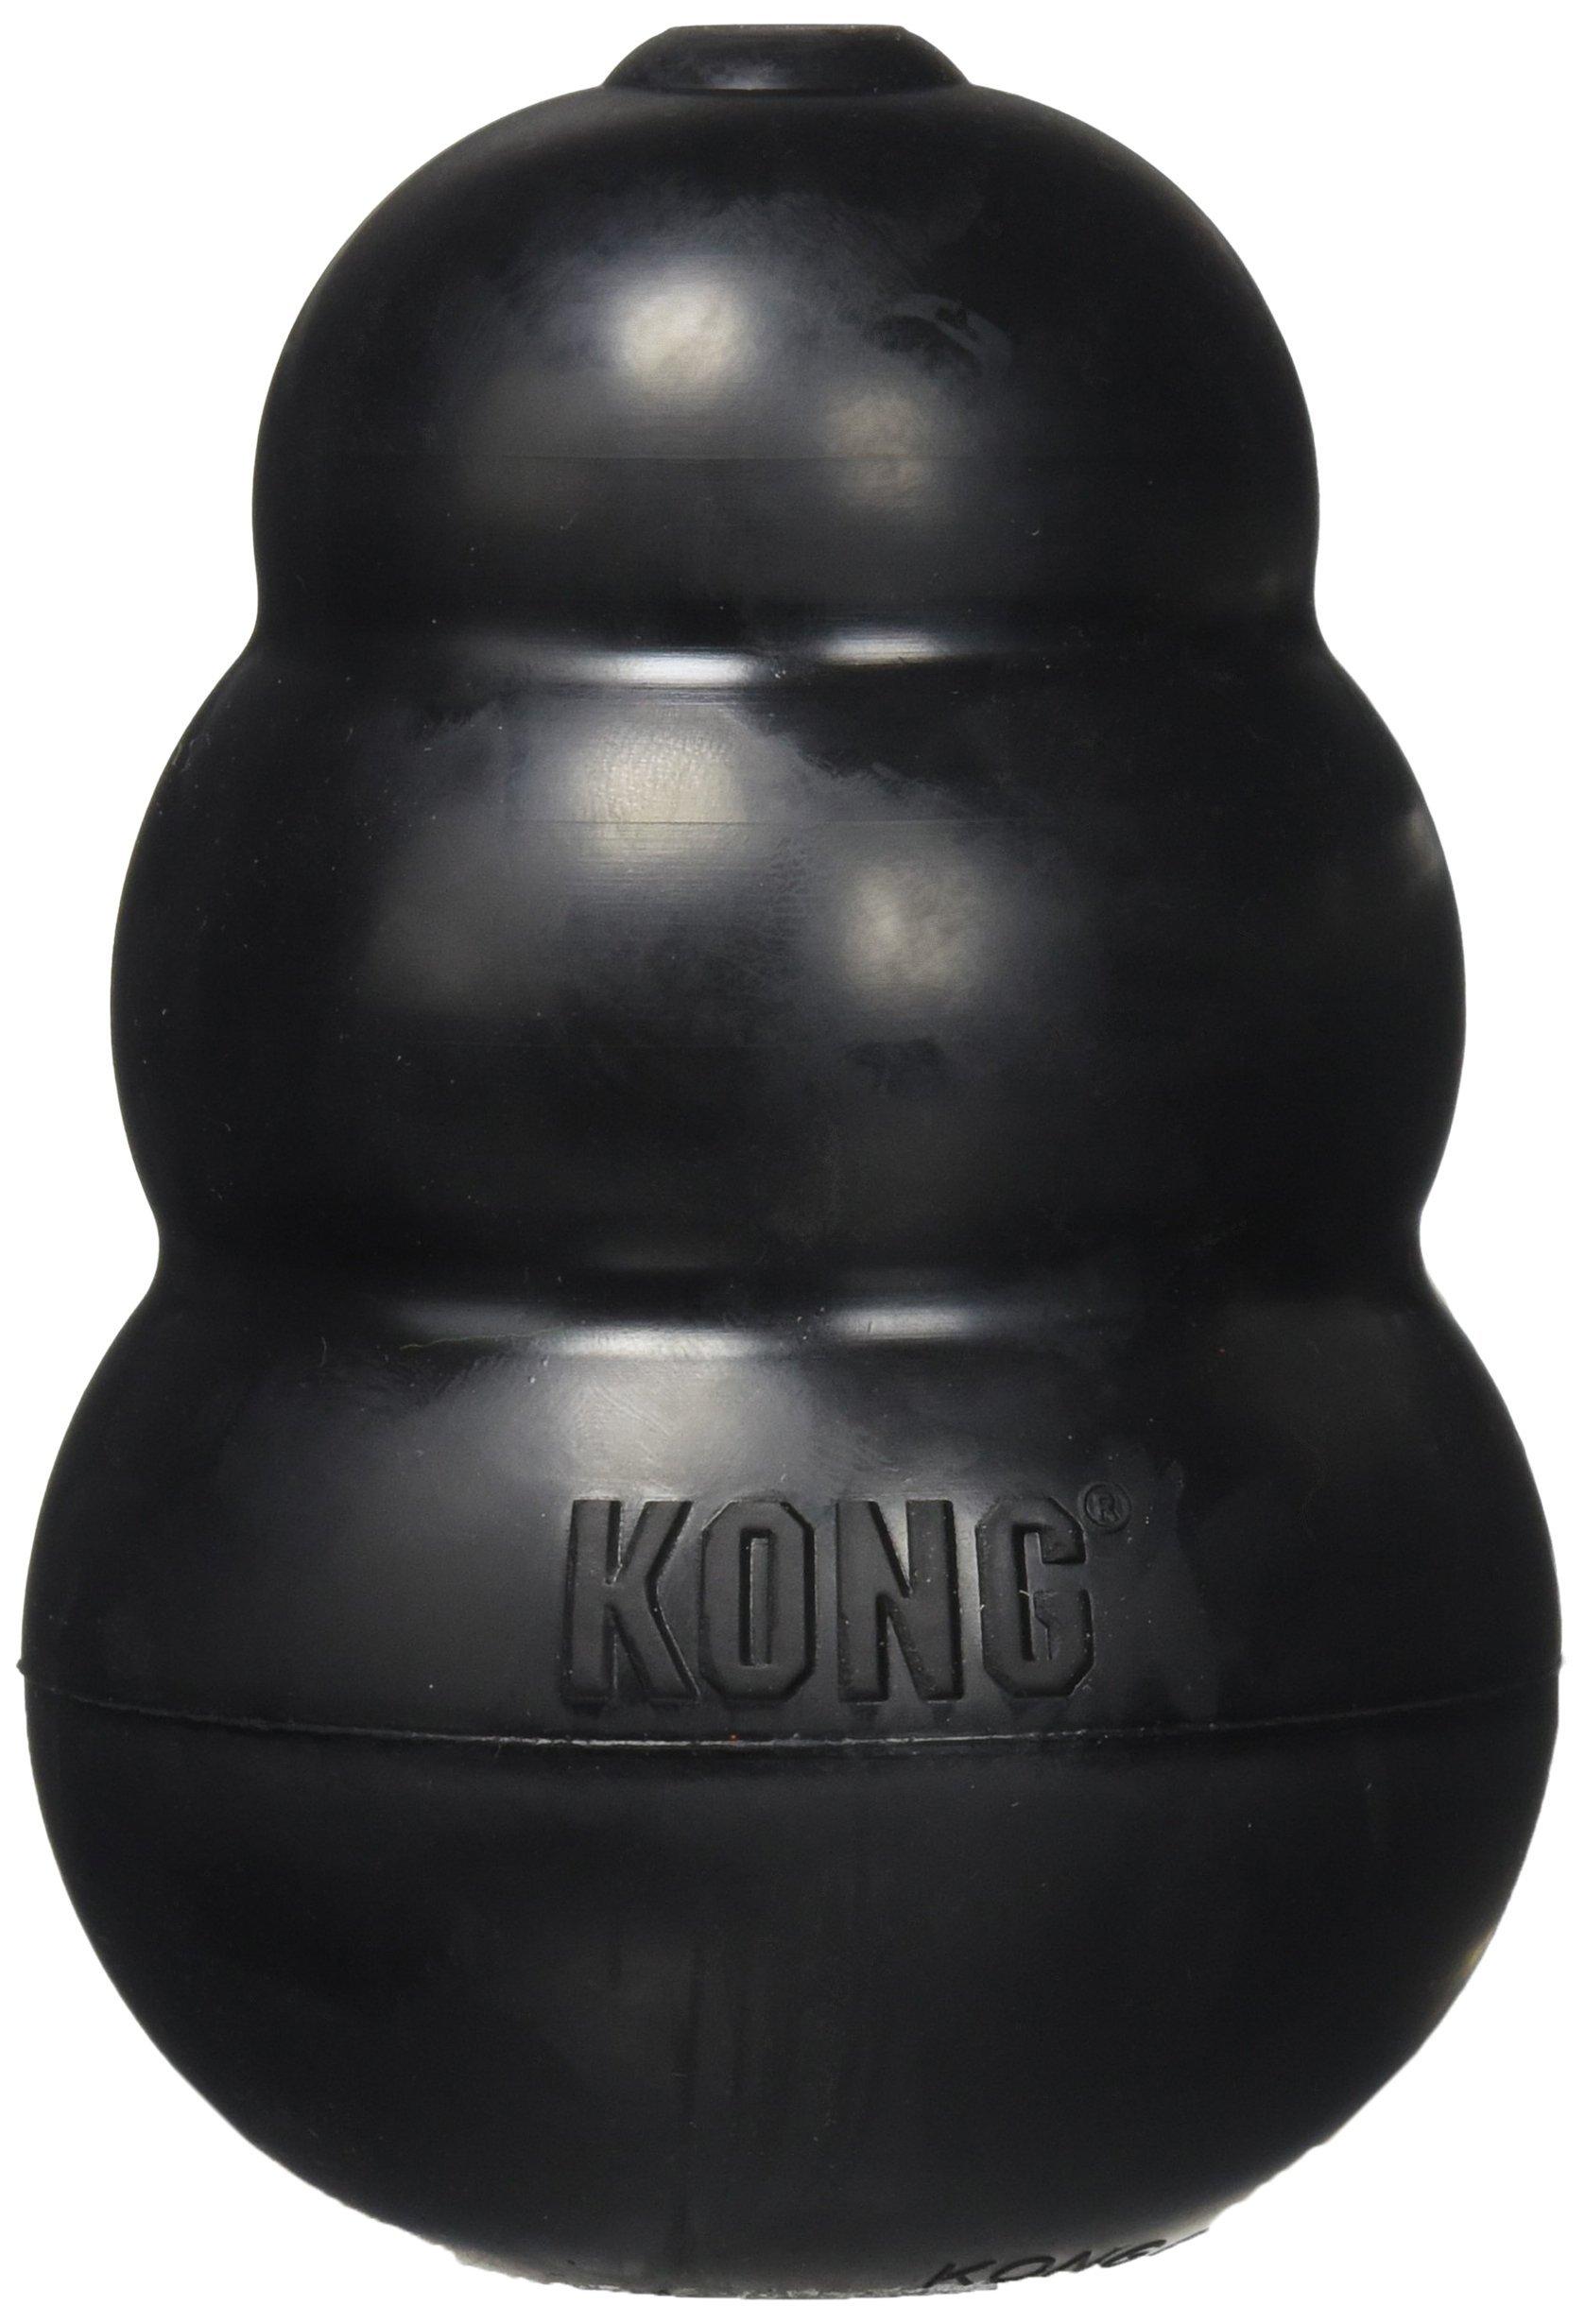 KONG Extreme Dog Toy (2 Pack), X-Large